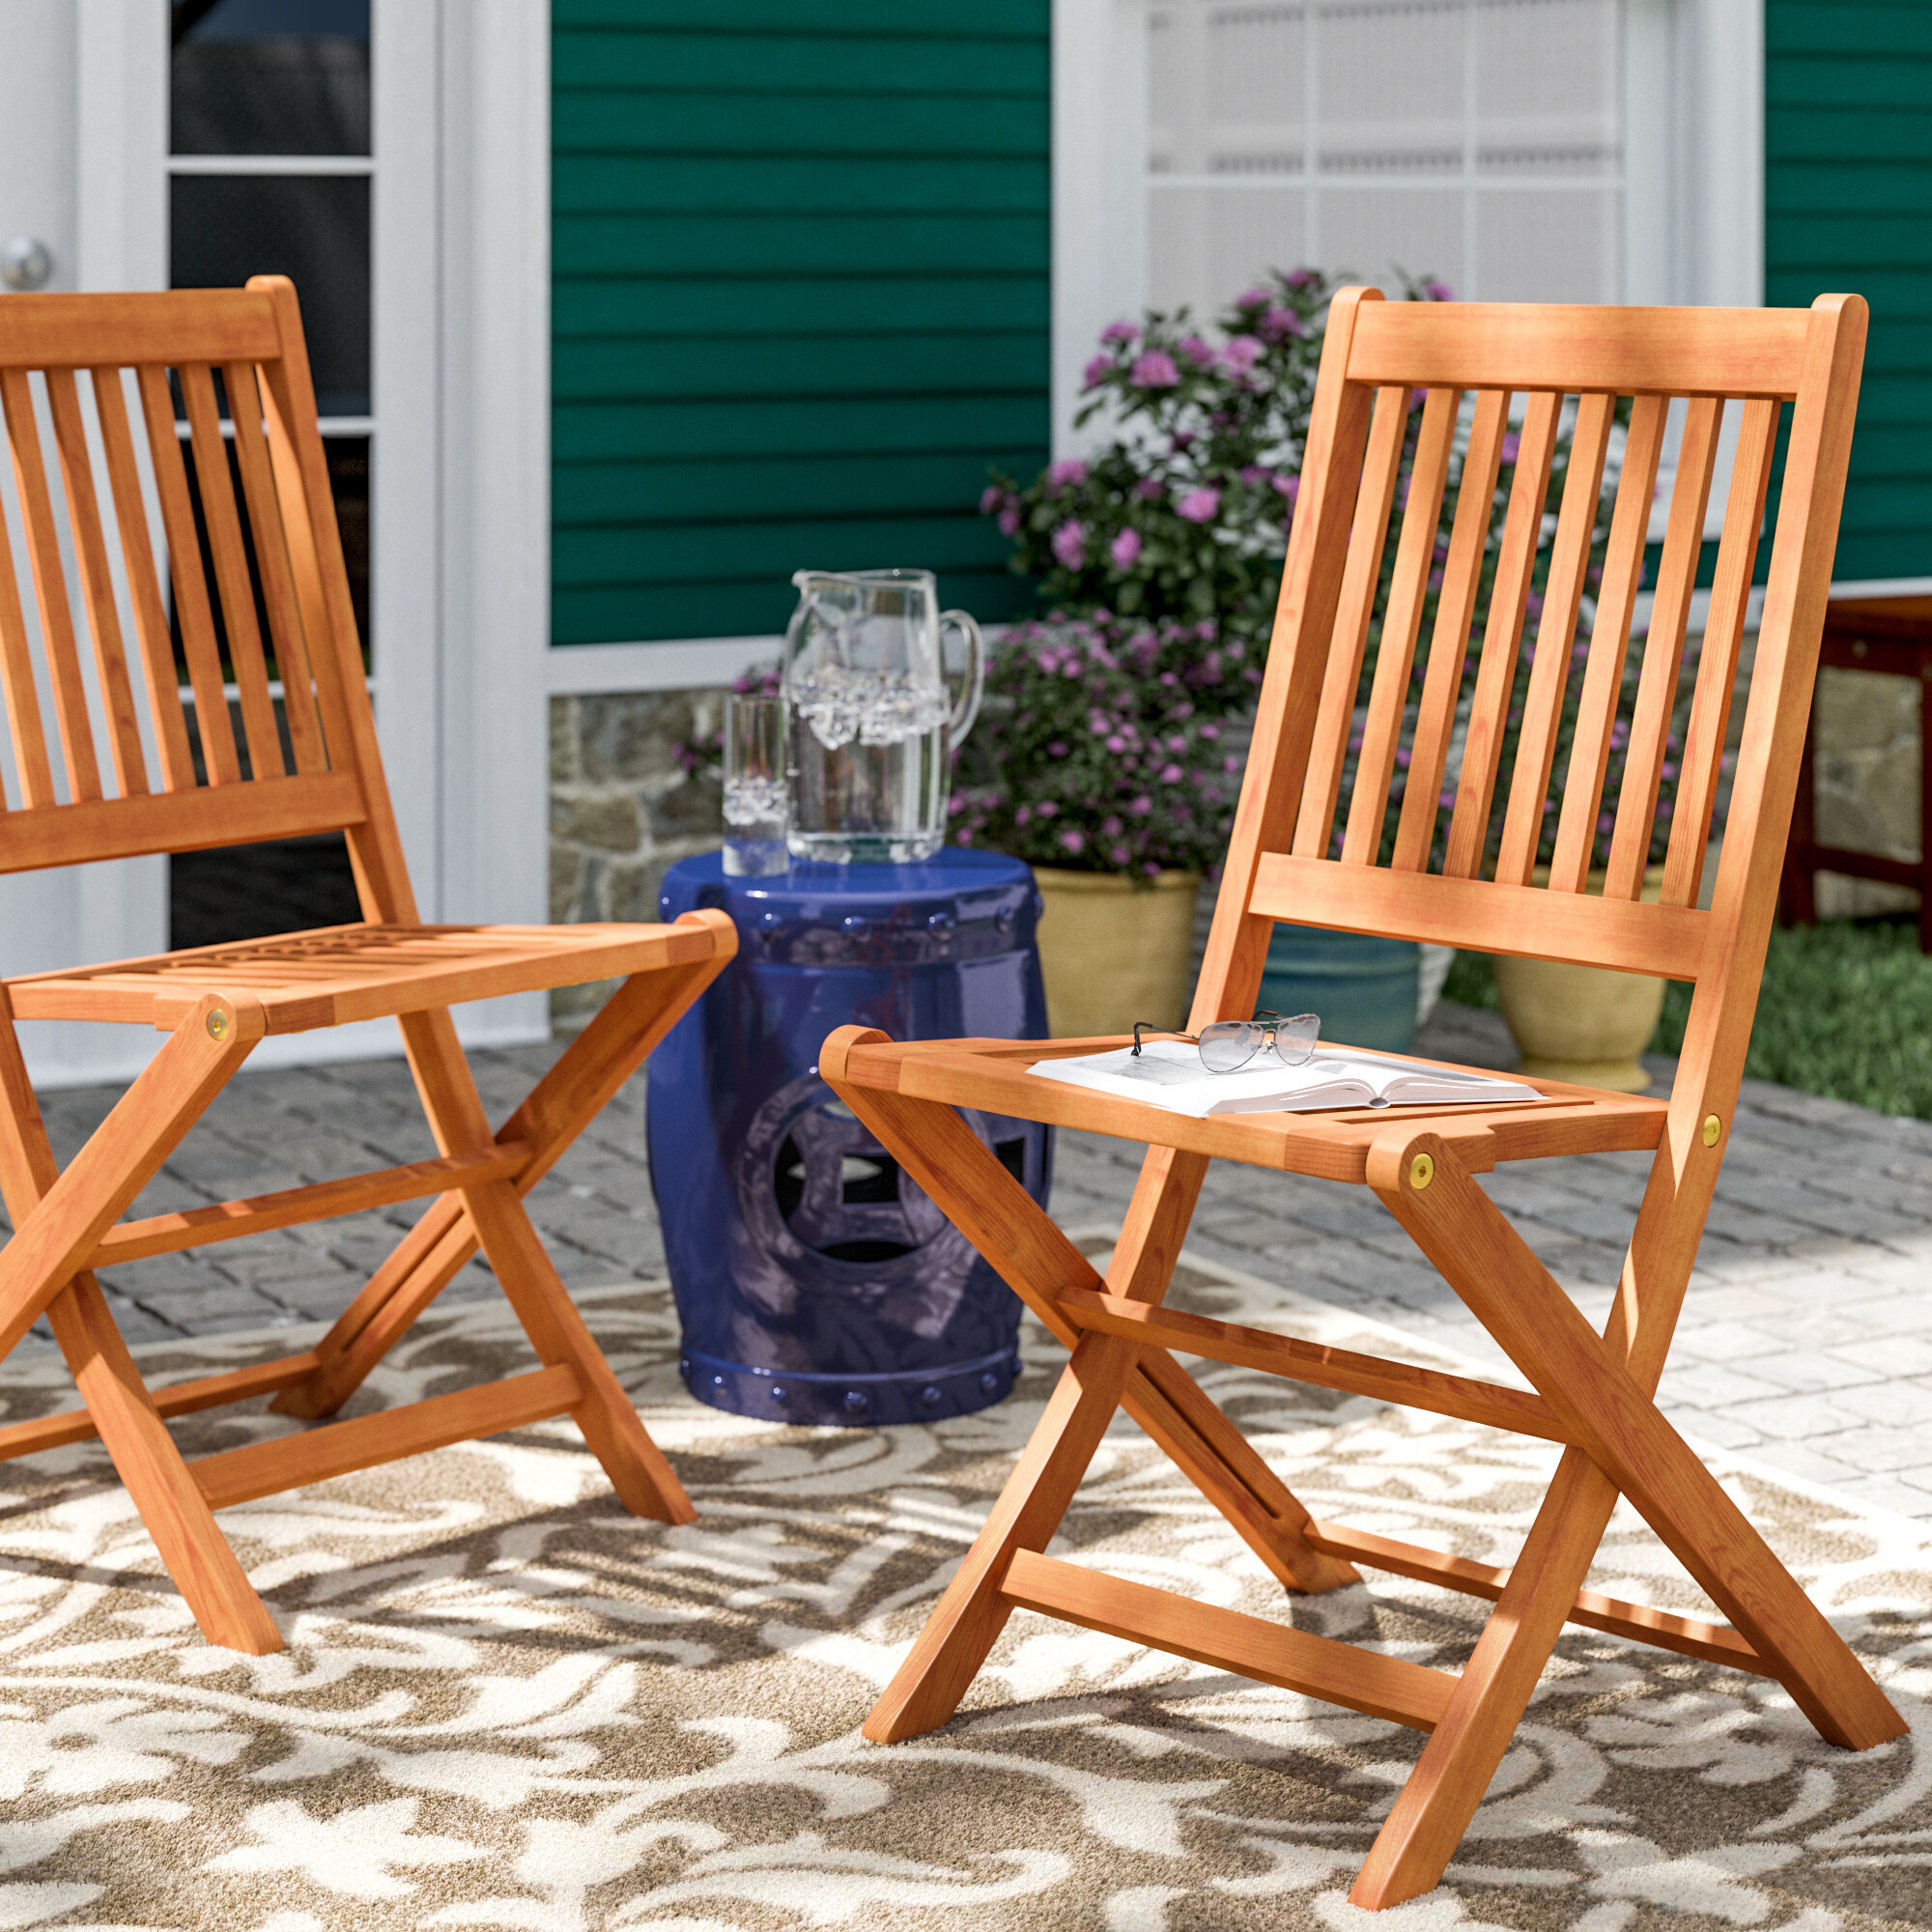 Cadsden Patio Folding Chair